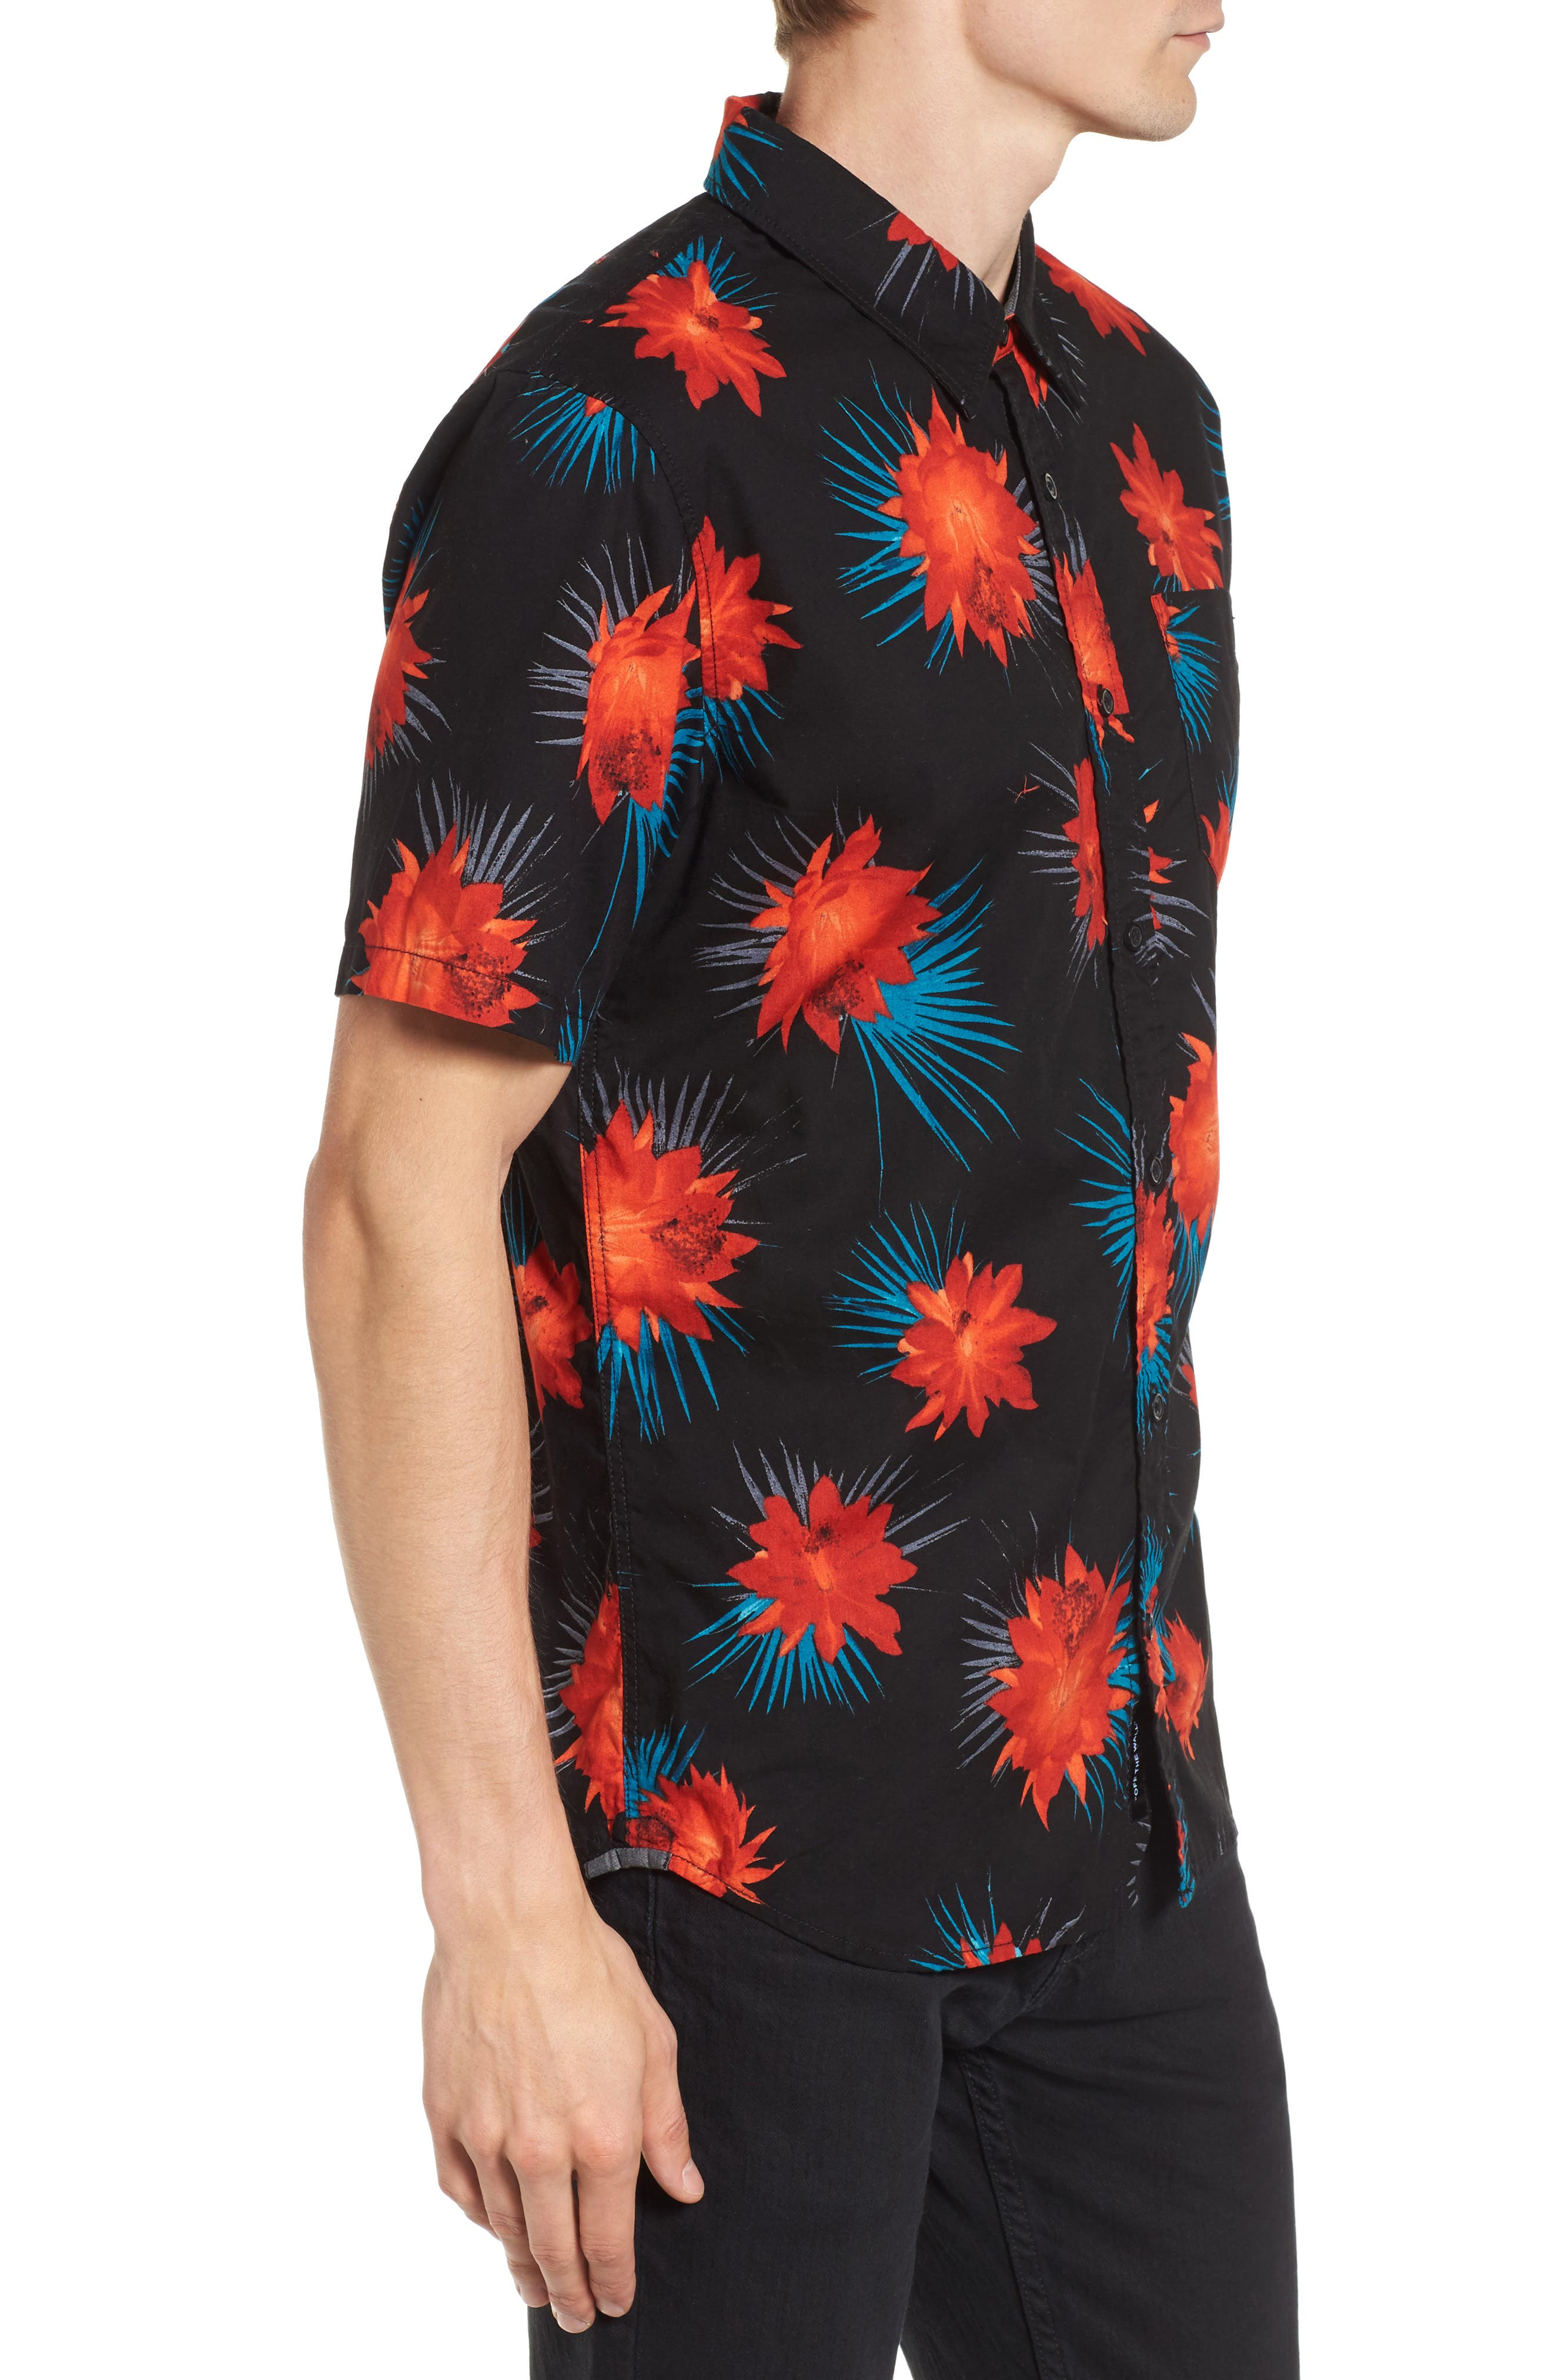 Cultivar Woven Shirt,                             Alternate thumbnail 3, color,                             001